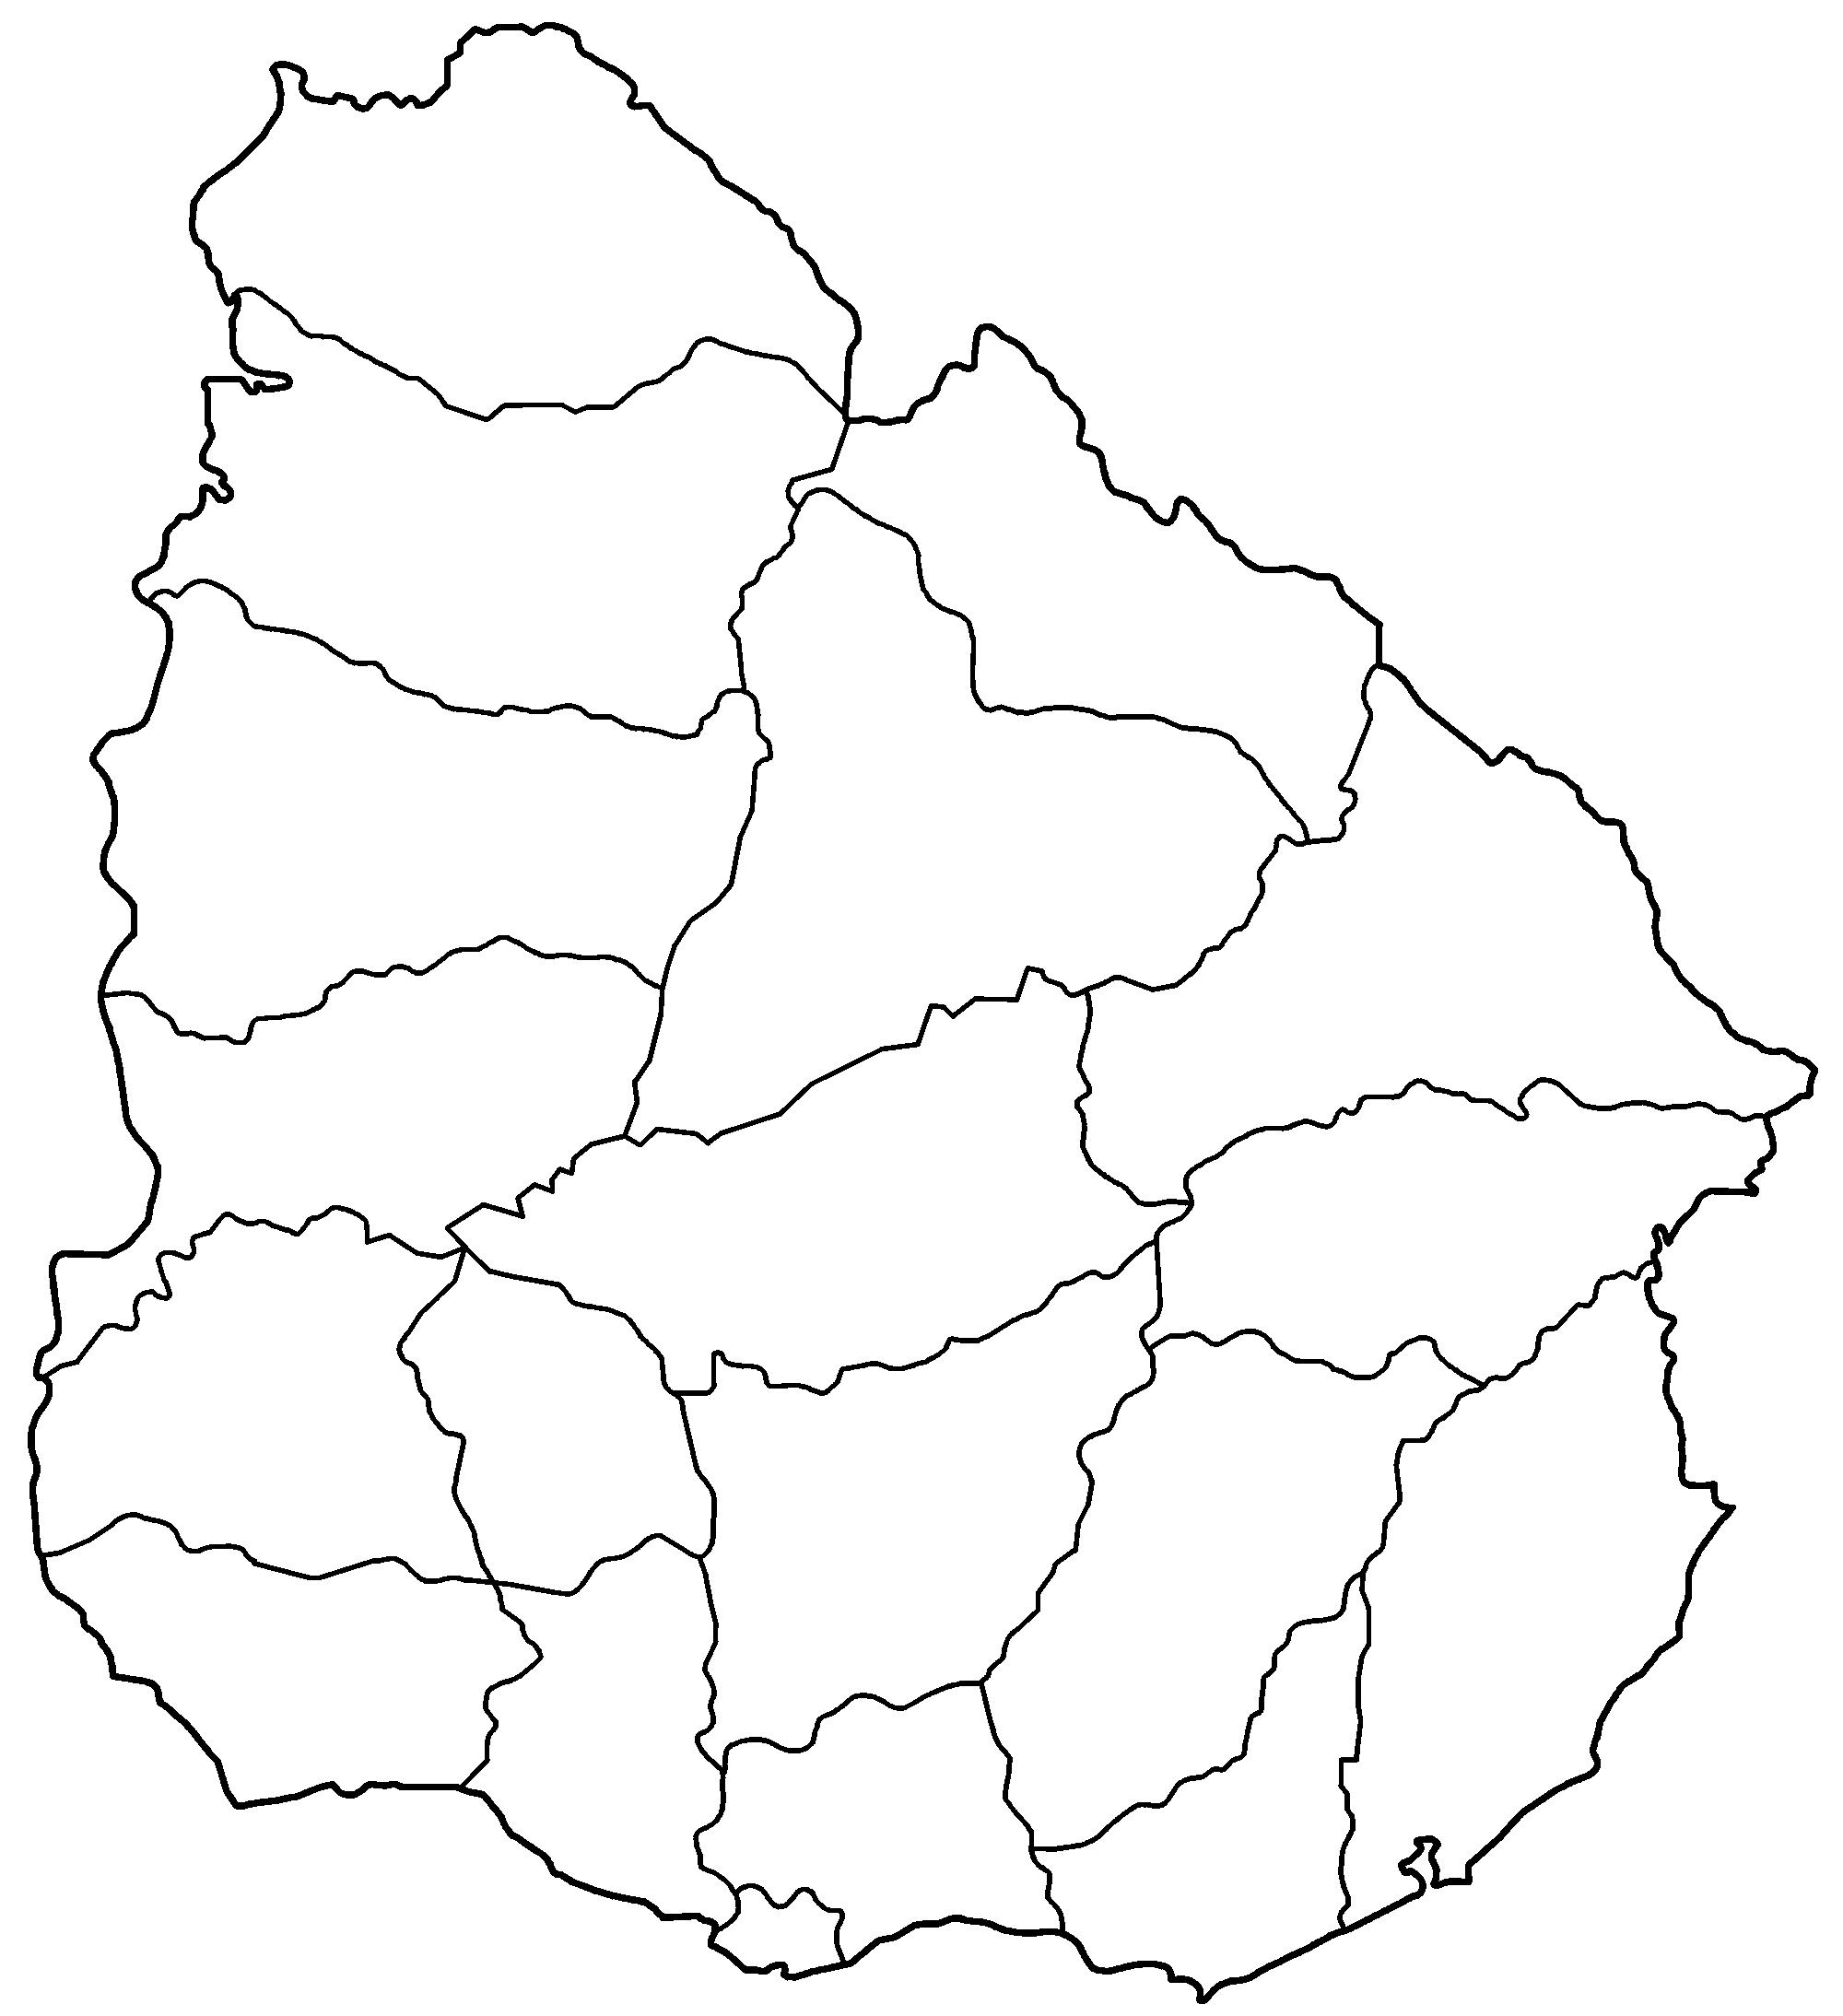 FileUruguay Departments Blankpng Wikimedia Commons - Uruguay blank map